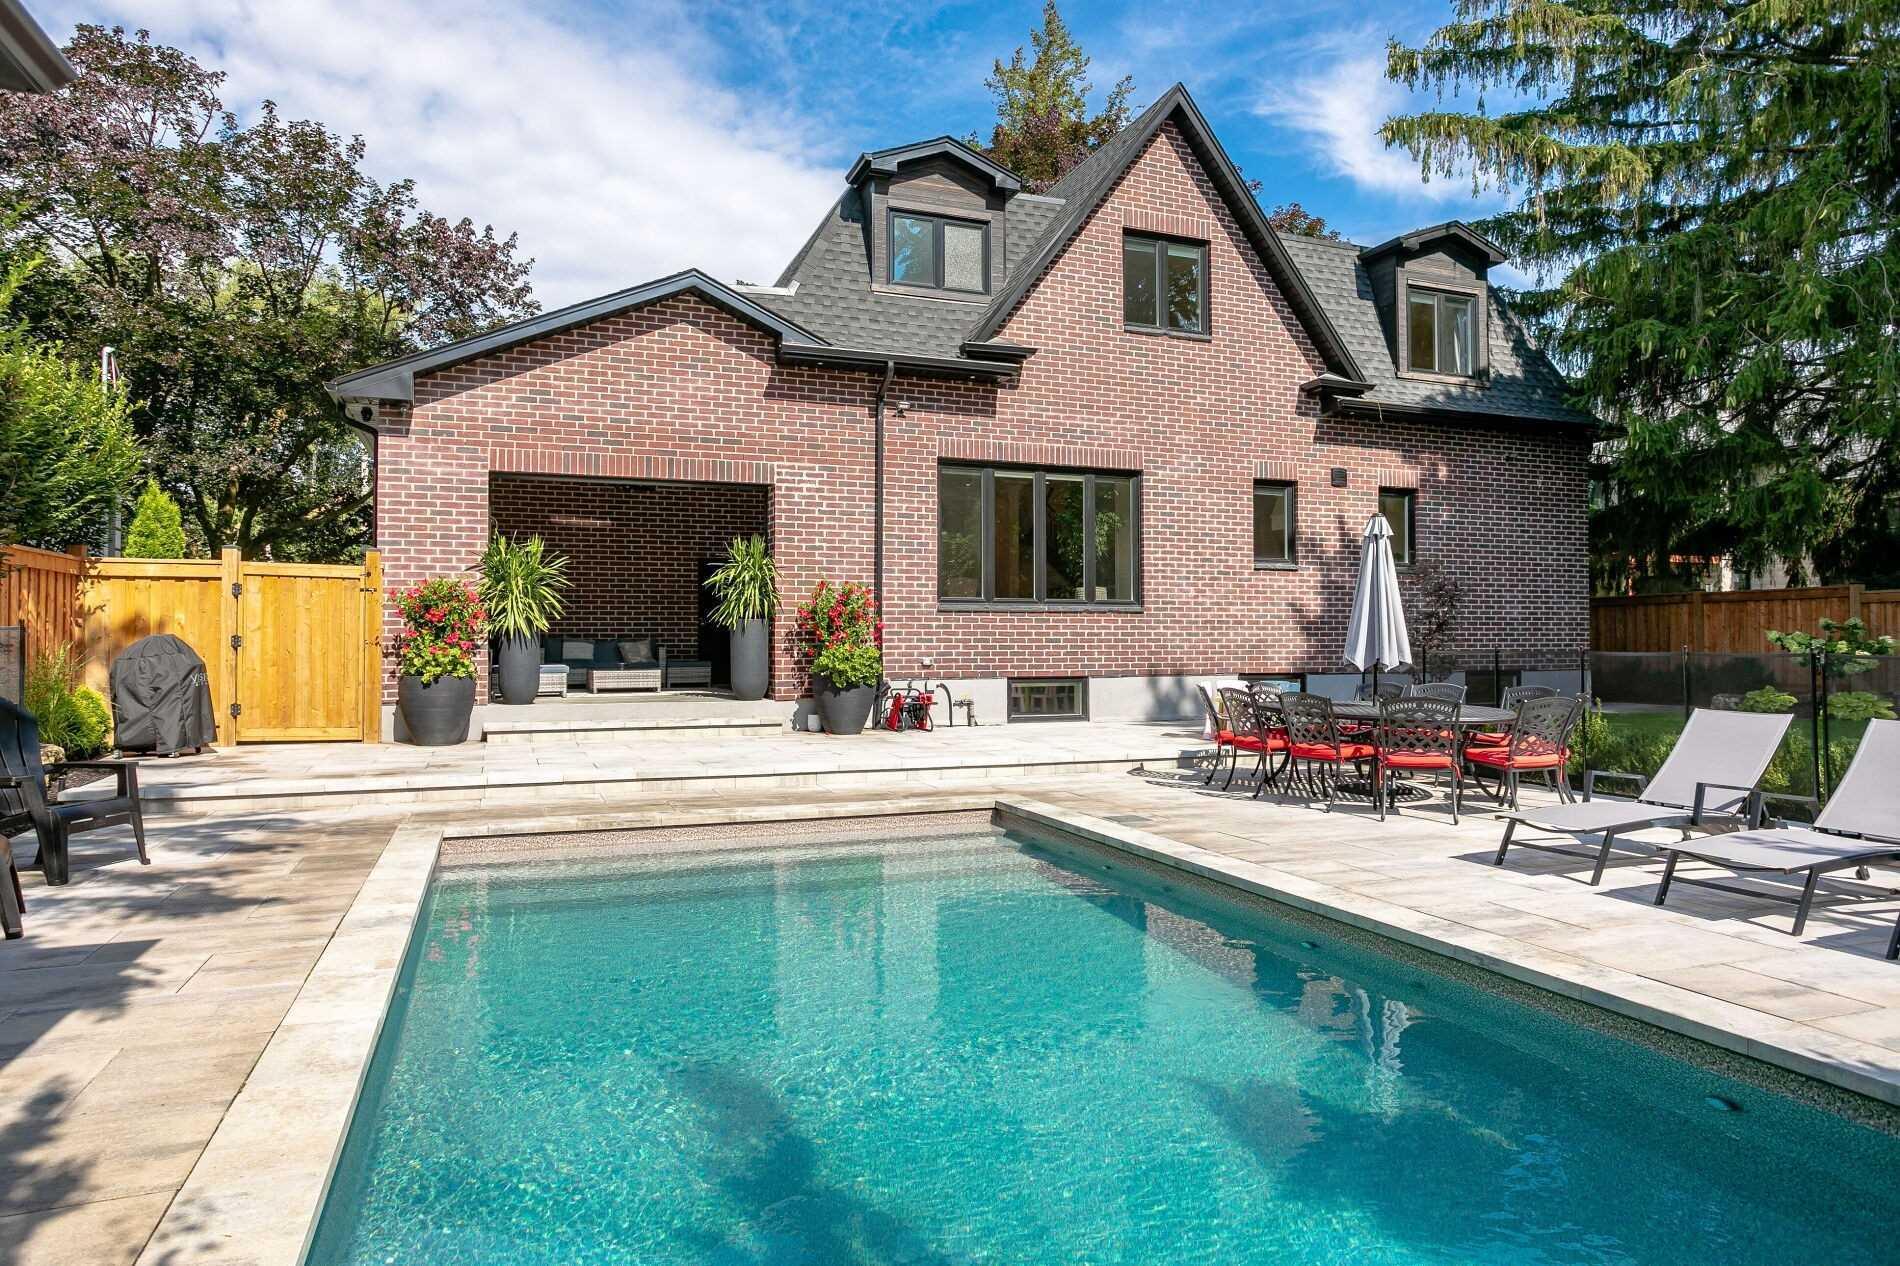 560 Vanessa Cres, Mississauga, Ontario L5H 2N3, 4 Bedrooms Bedrooms, 13 Rooms Rooms,4 BathroomsBathrooms,Detached,For Sale,Vanessa,W5361610